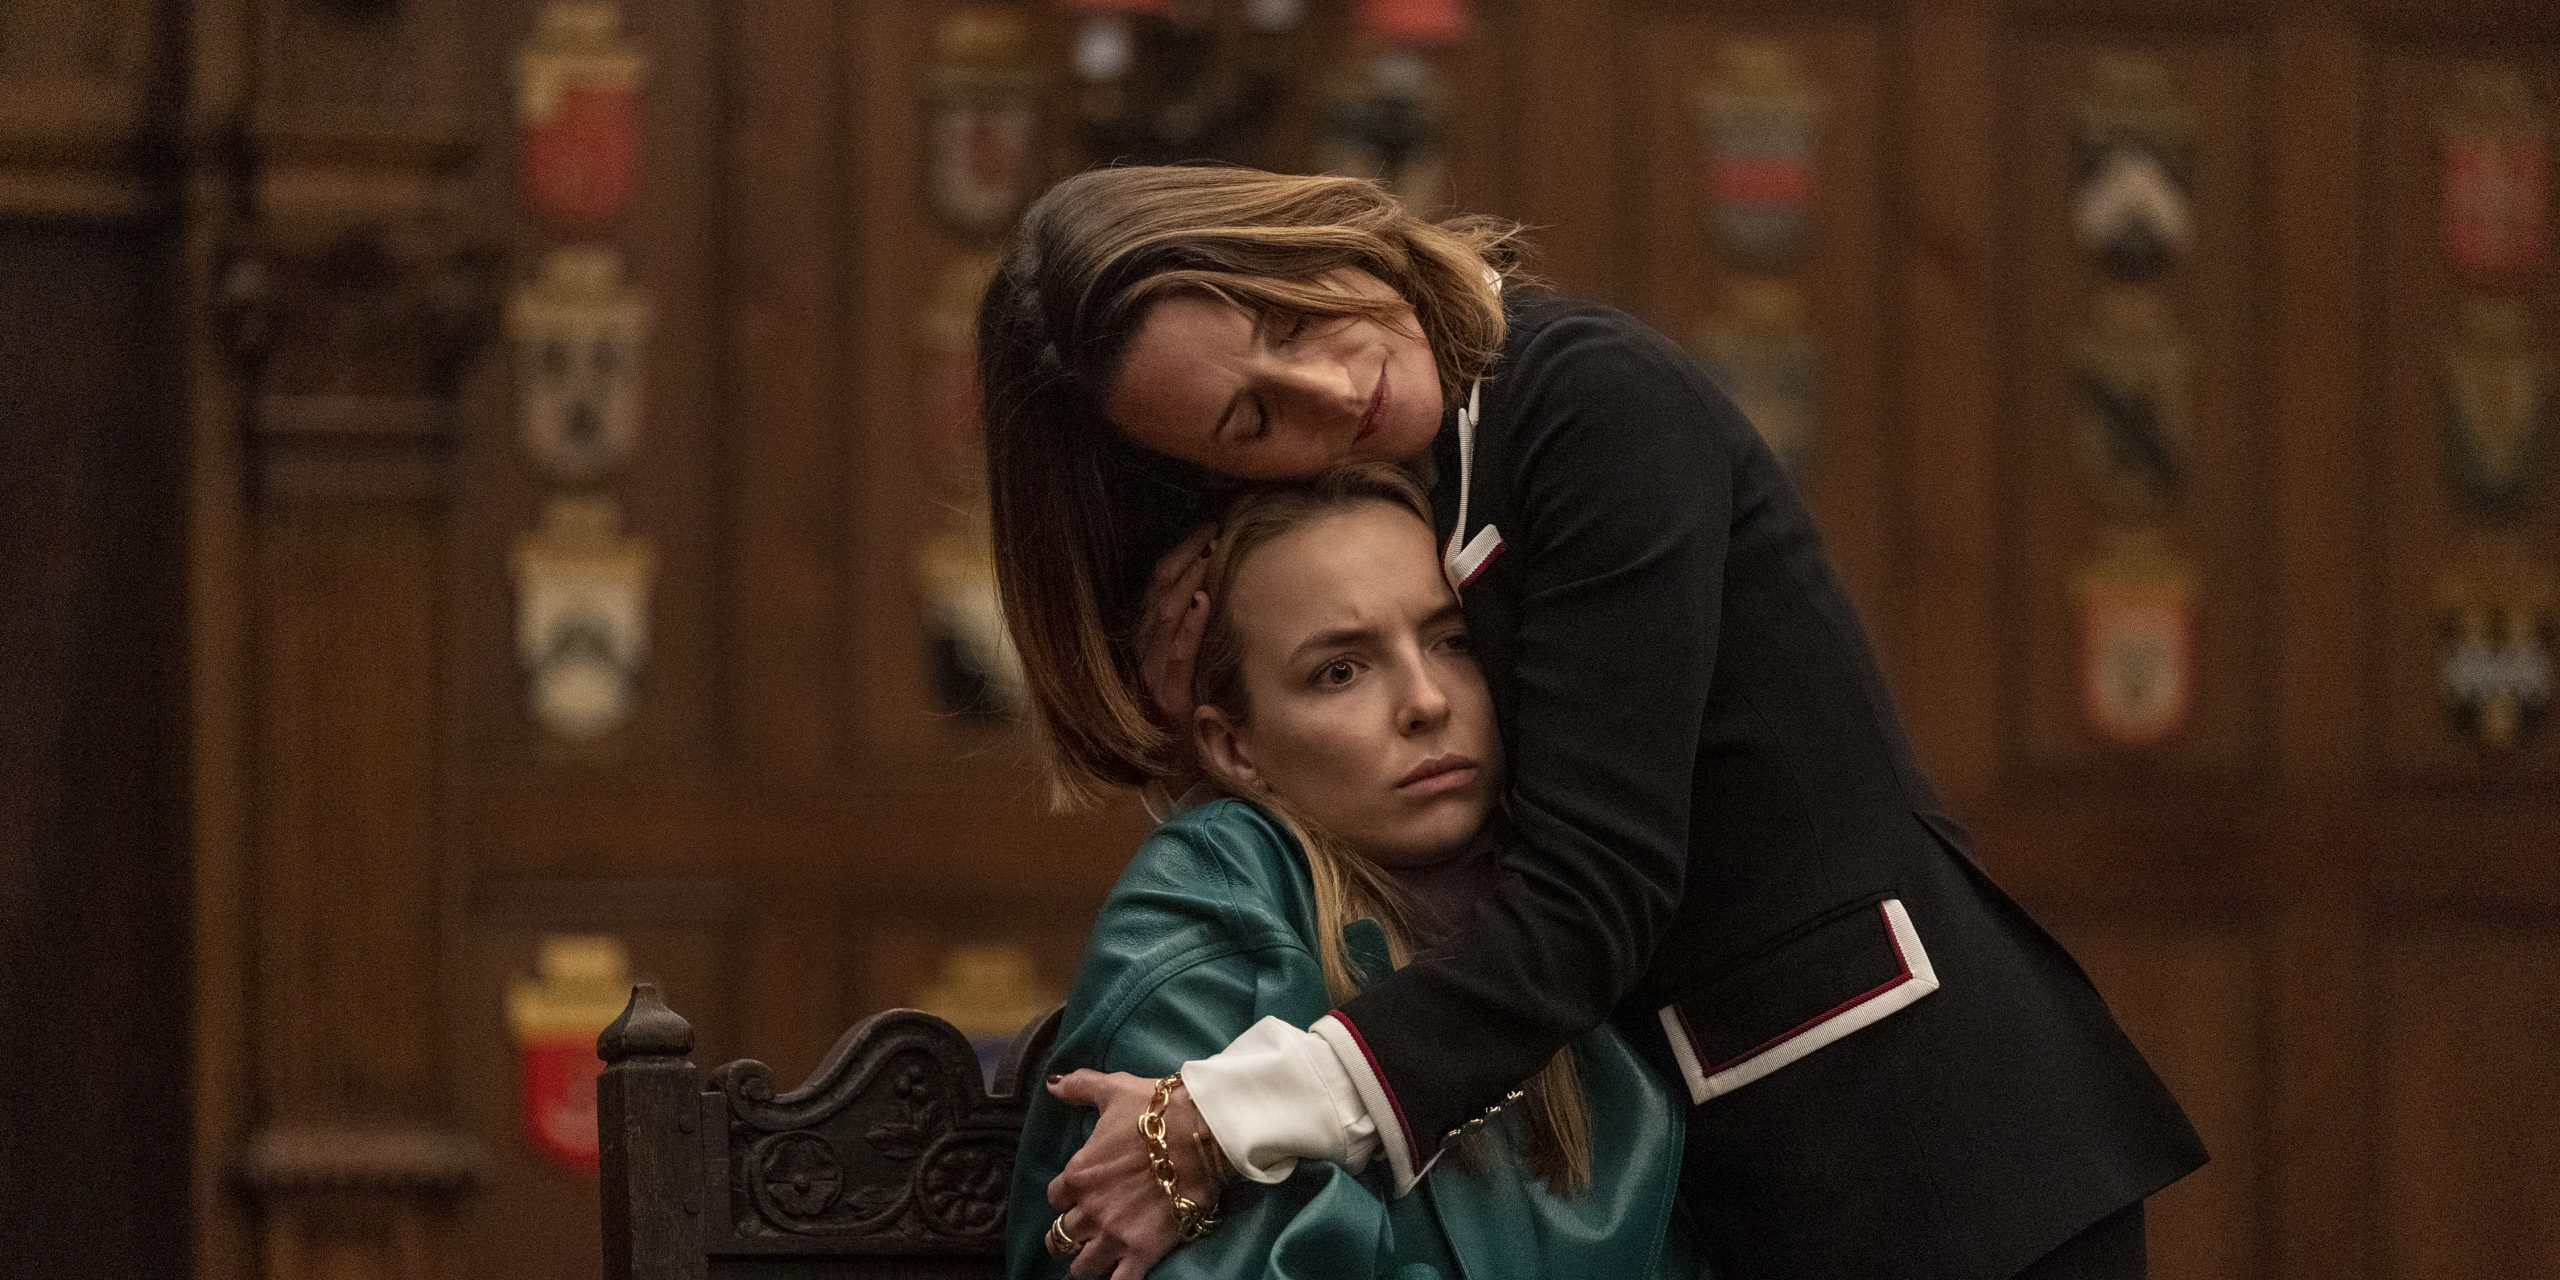 Killing Eve Season 3 Episode 8 Finale Spoilers